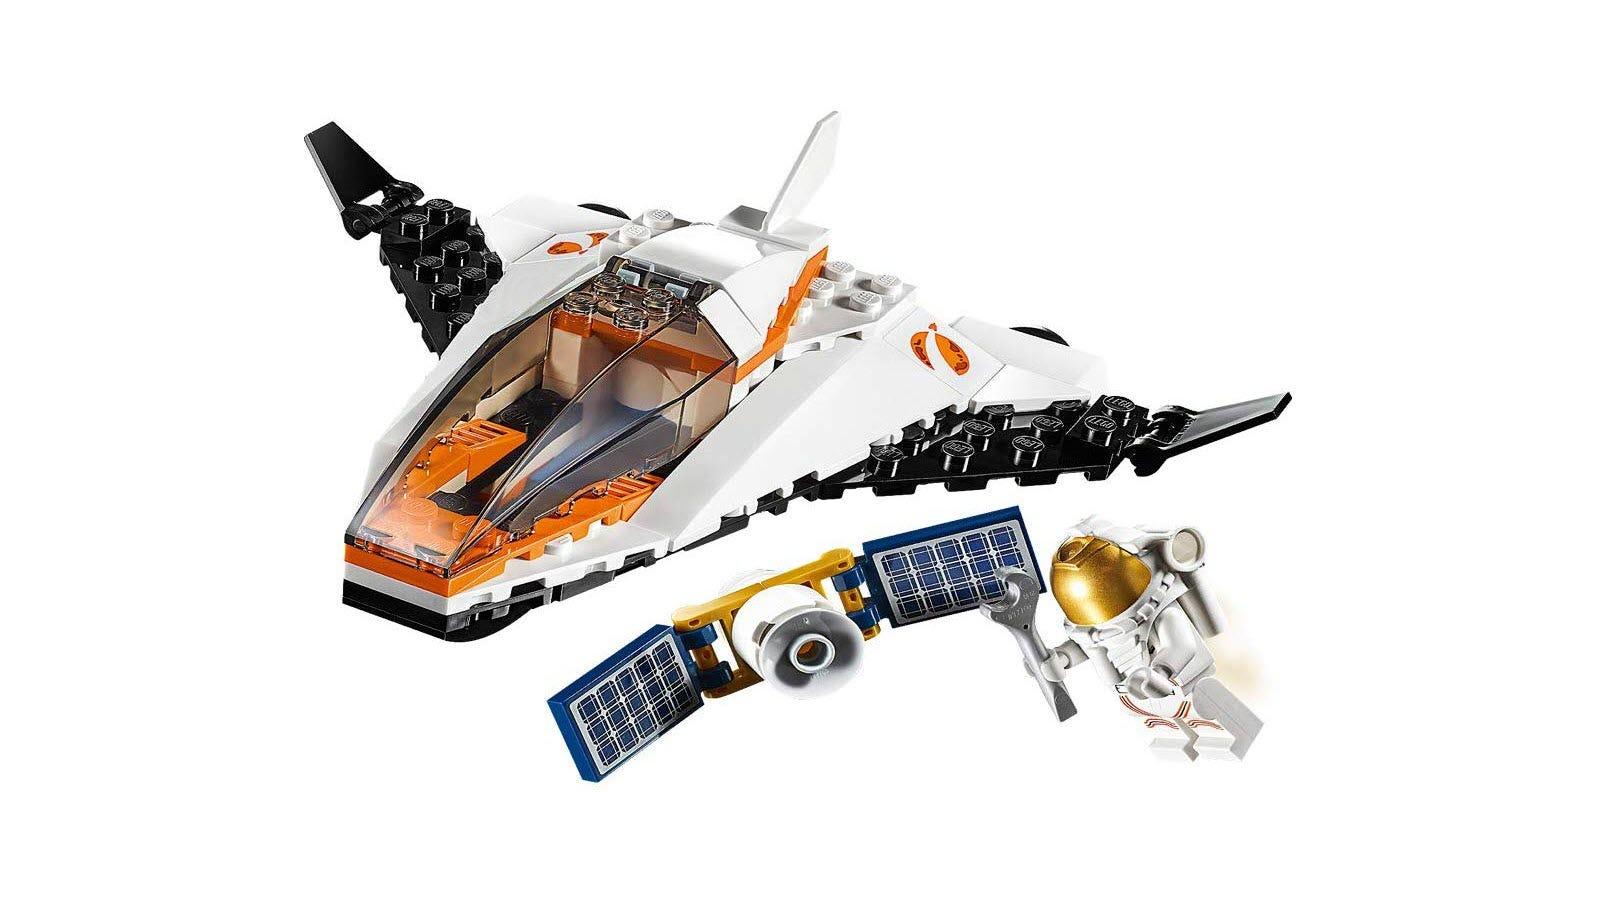 A LEGO satellite, shuttle, and astronaut mini-fig.